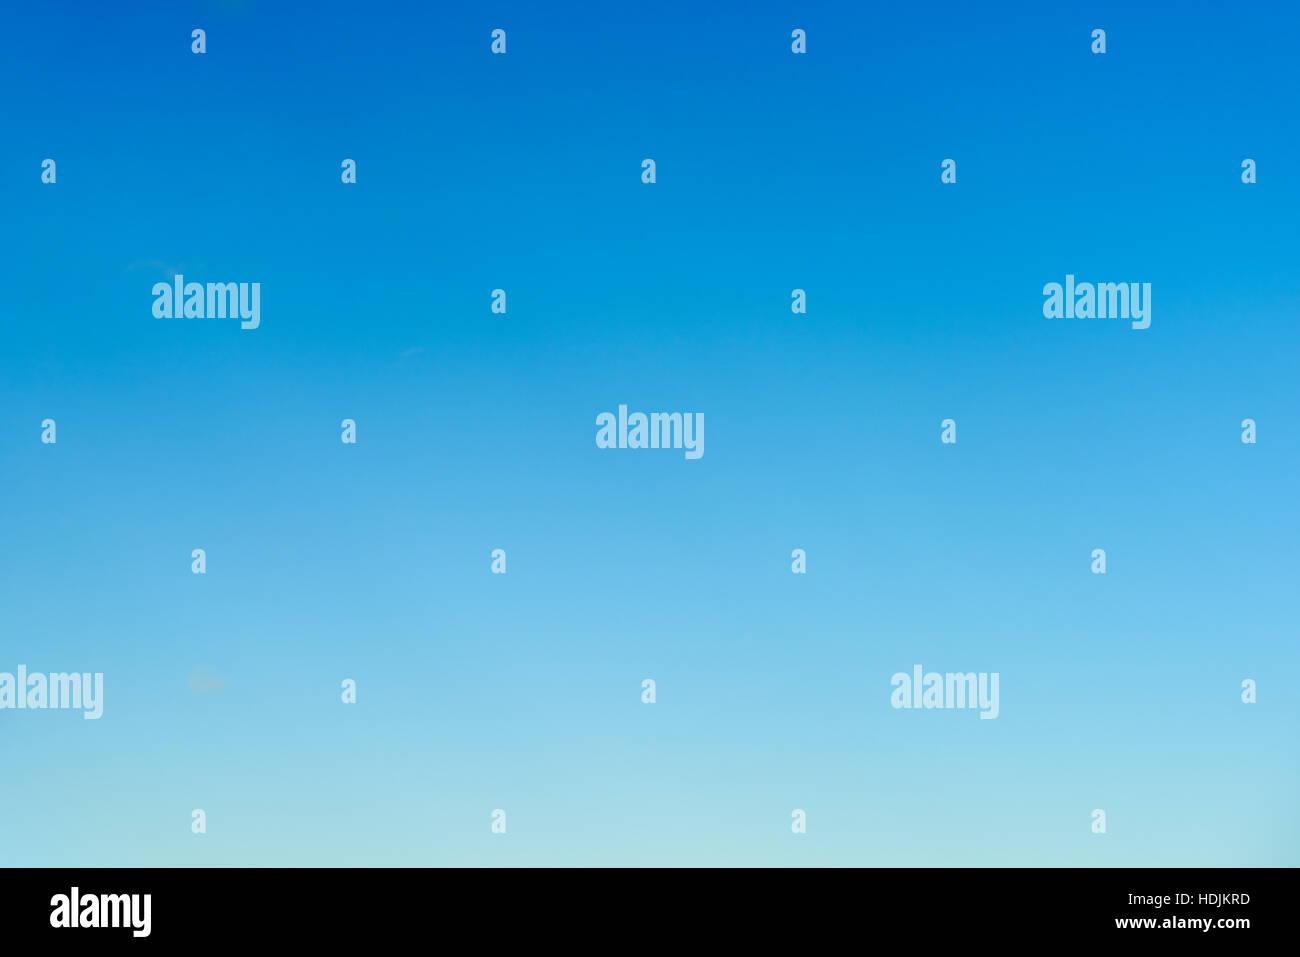 Claro Cielo Azul Turquesa Fondo Degradado Foto Imagen De Stock